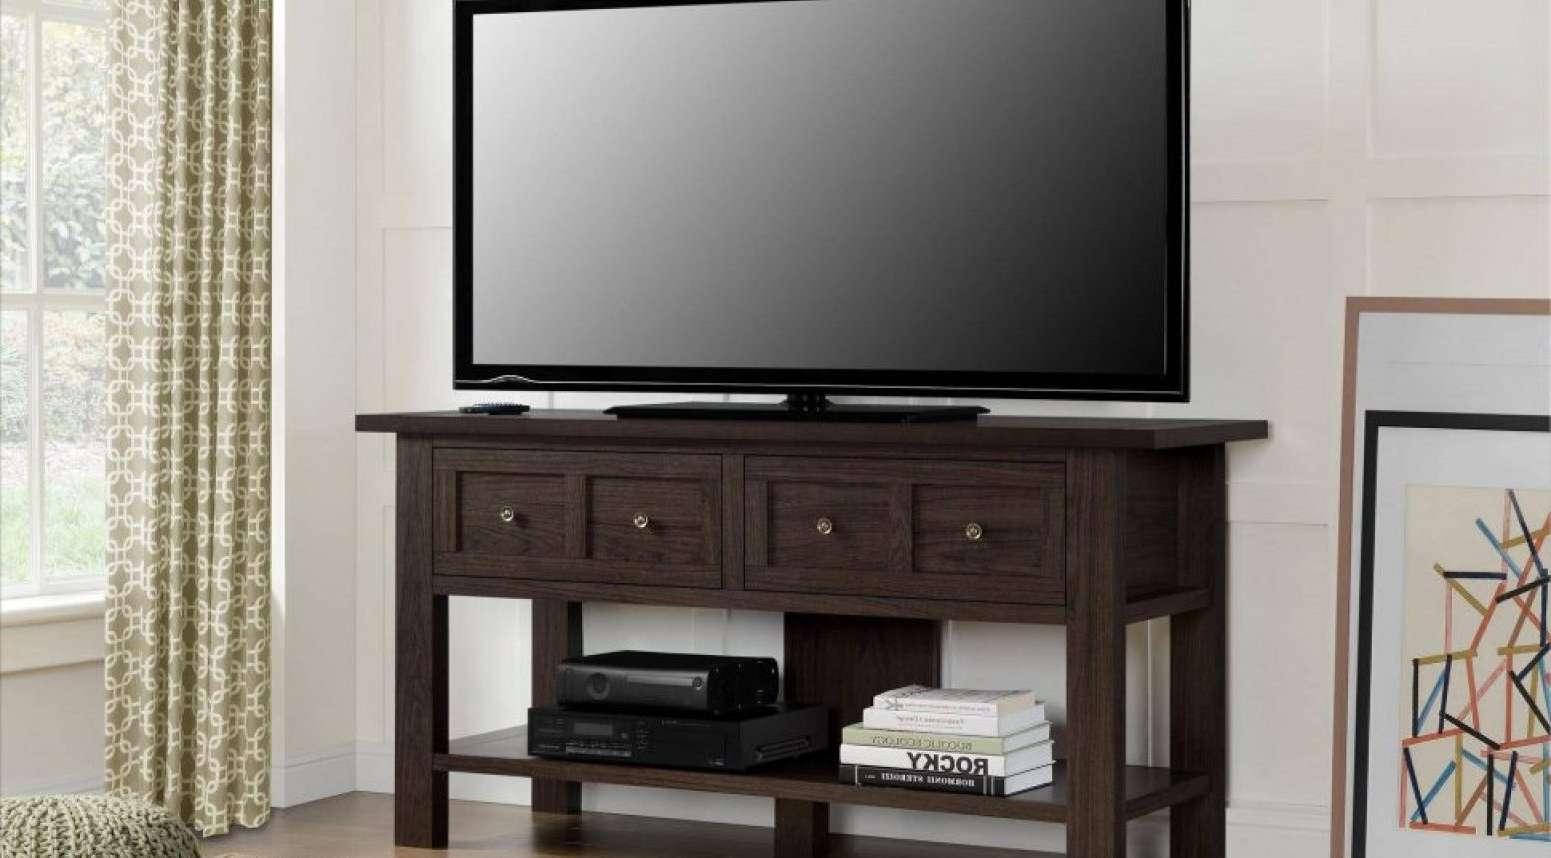 Tv : Fearsome Greenapple Tv Stands Elegant Green Tv Stands Inside Green Tv Stands (View 15 of 15)